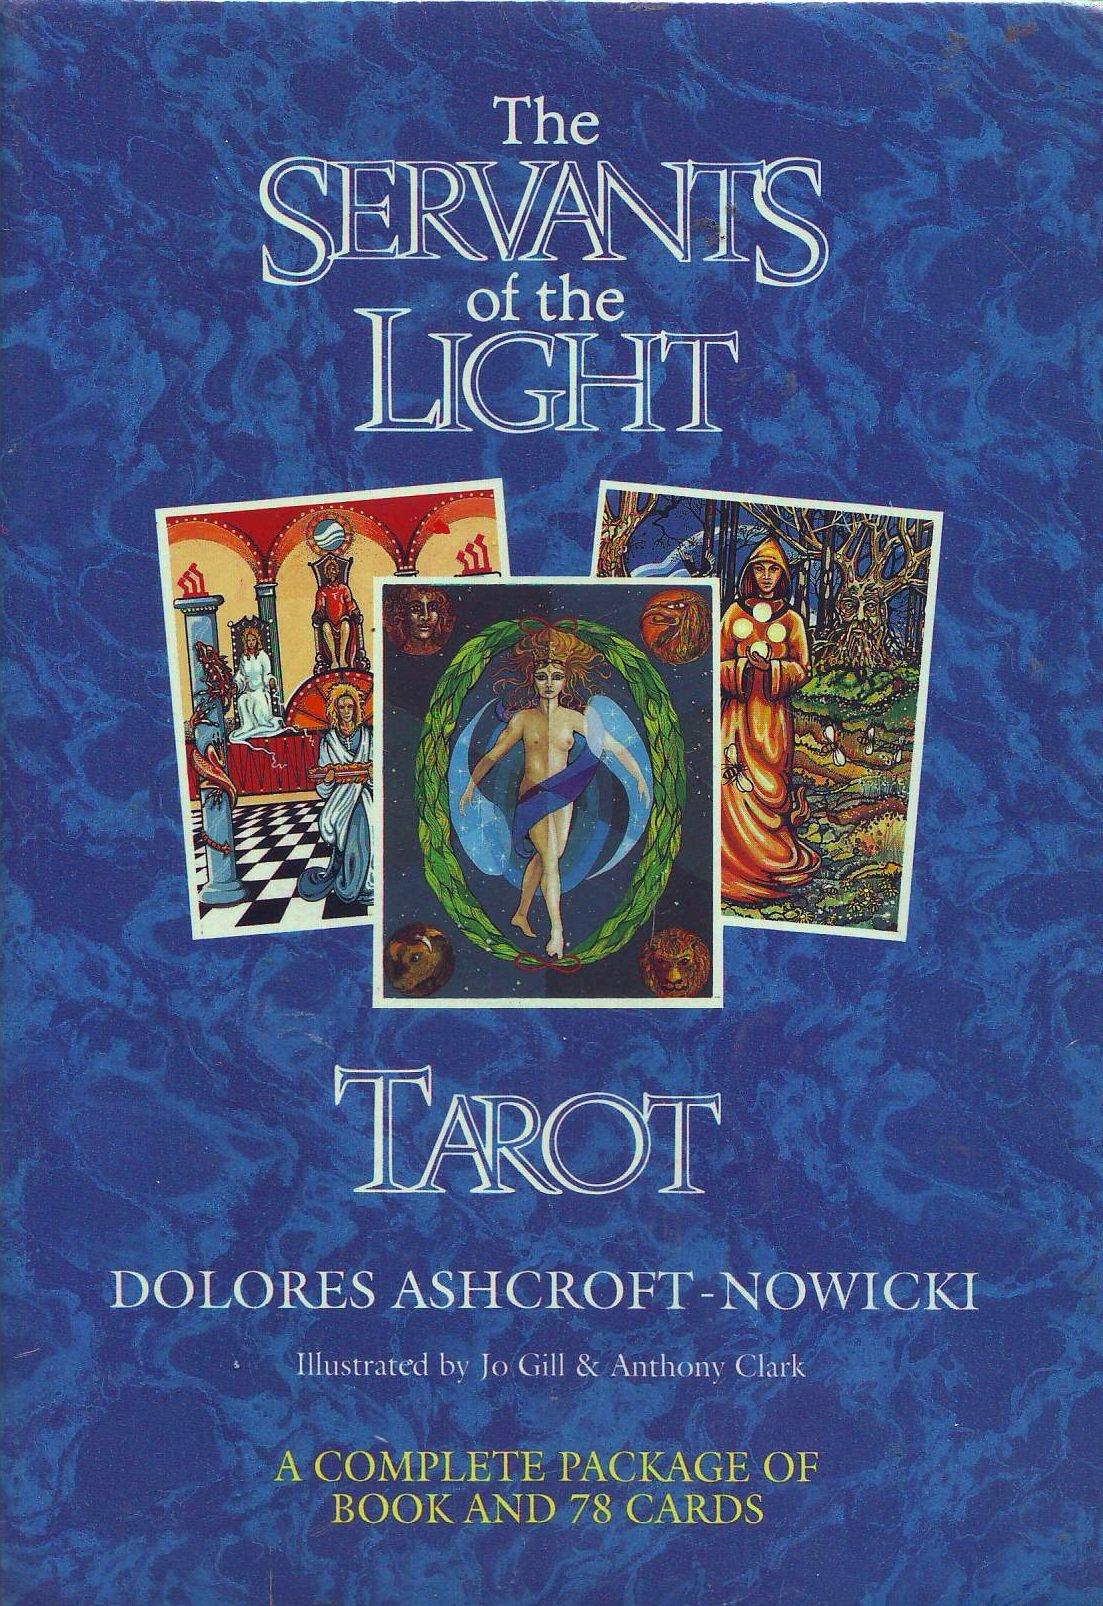 The Servants of the Light: Tarot Pack: Amazon.es: Ashcroft-Nowicki, Dolores, Gill, Jo, Clark, Anthony: Libros en idiomas extranjeros